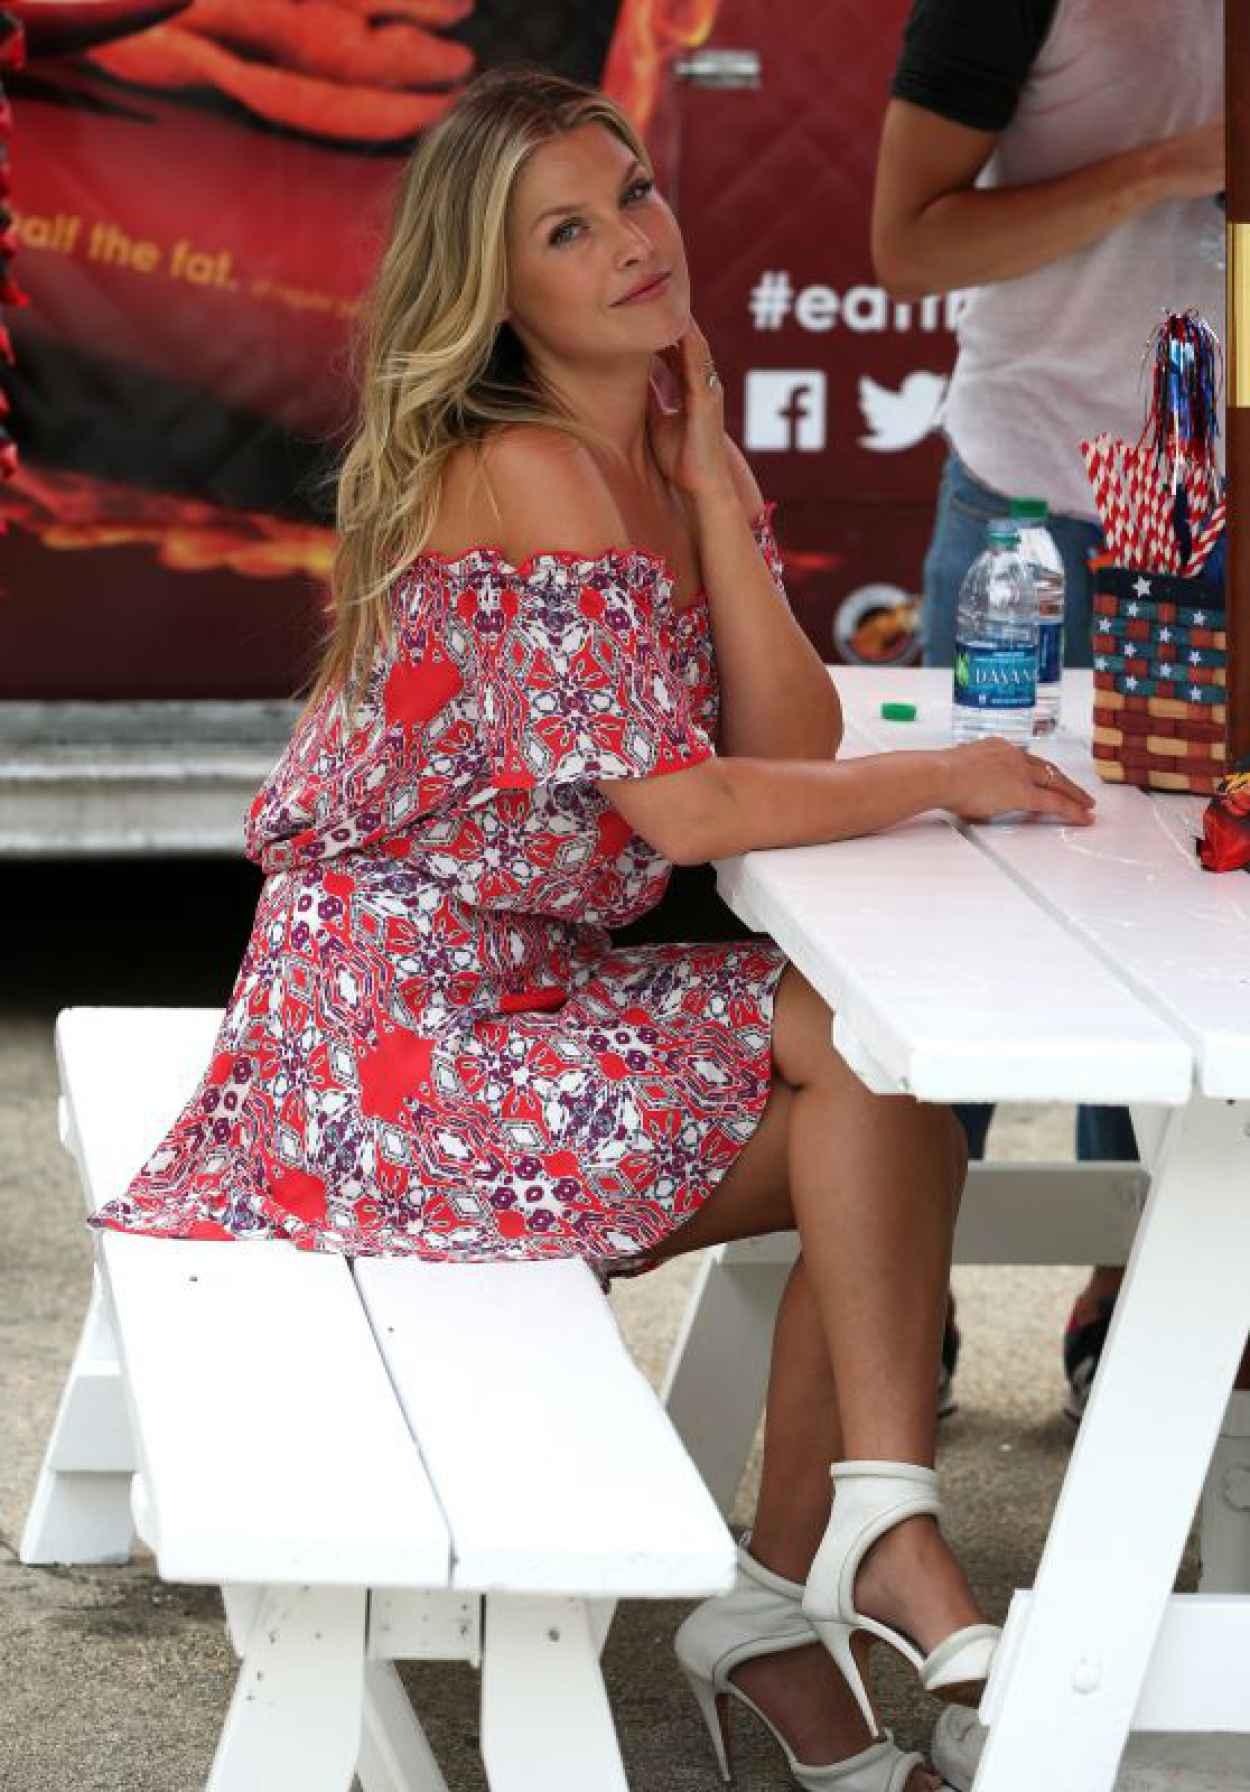 Ali Larter Hot Pics - Hosting Popchips Crazy Hot Summer BBQ Event in New York City-1